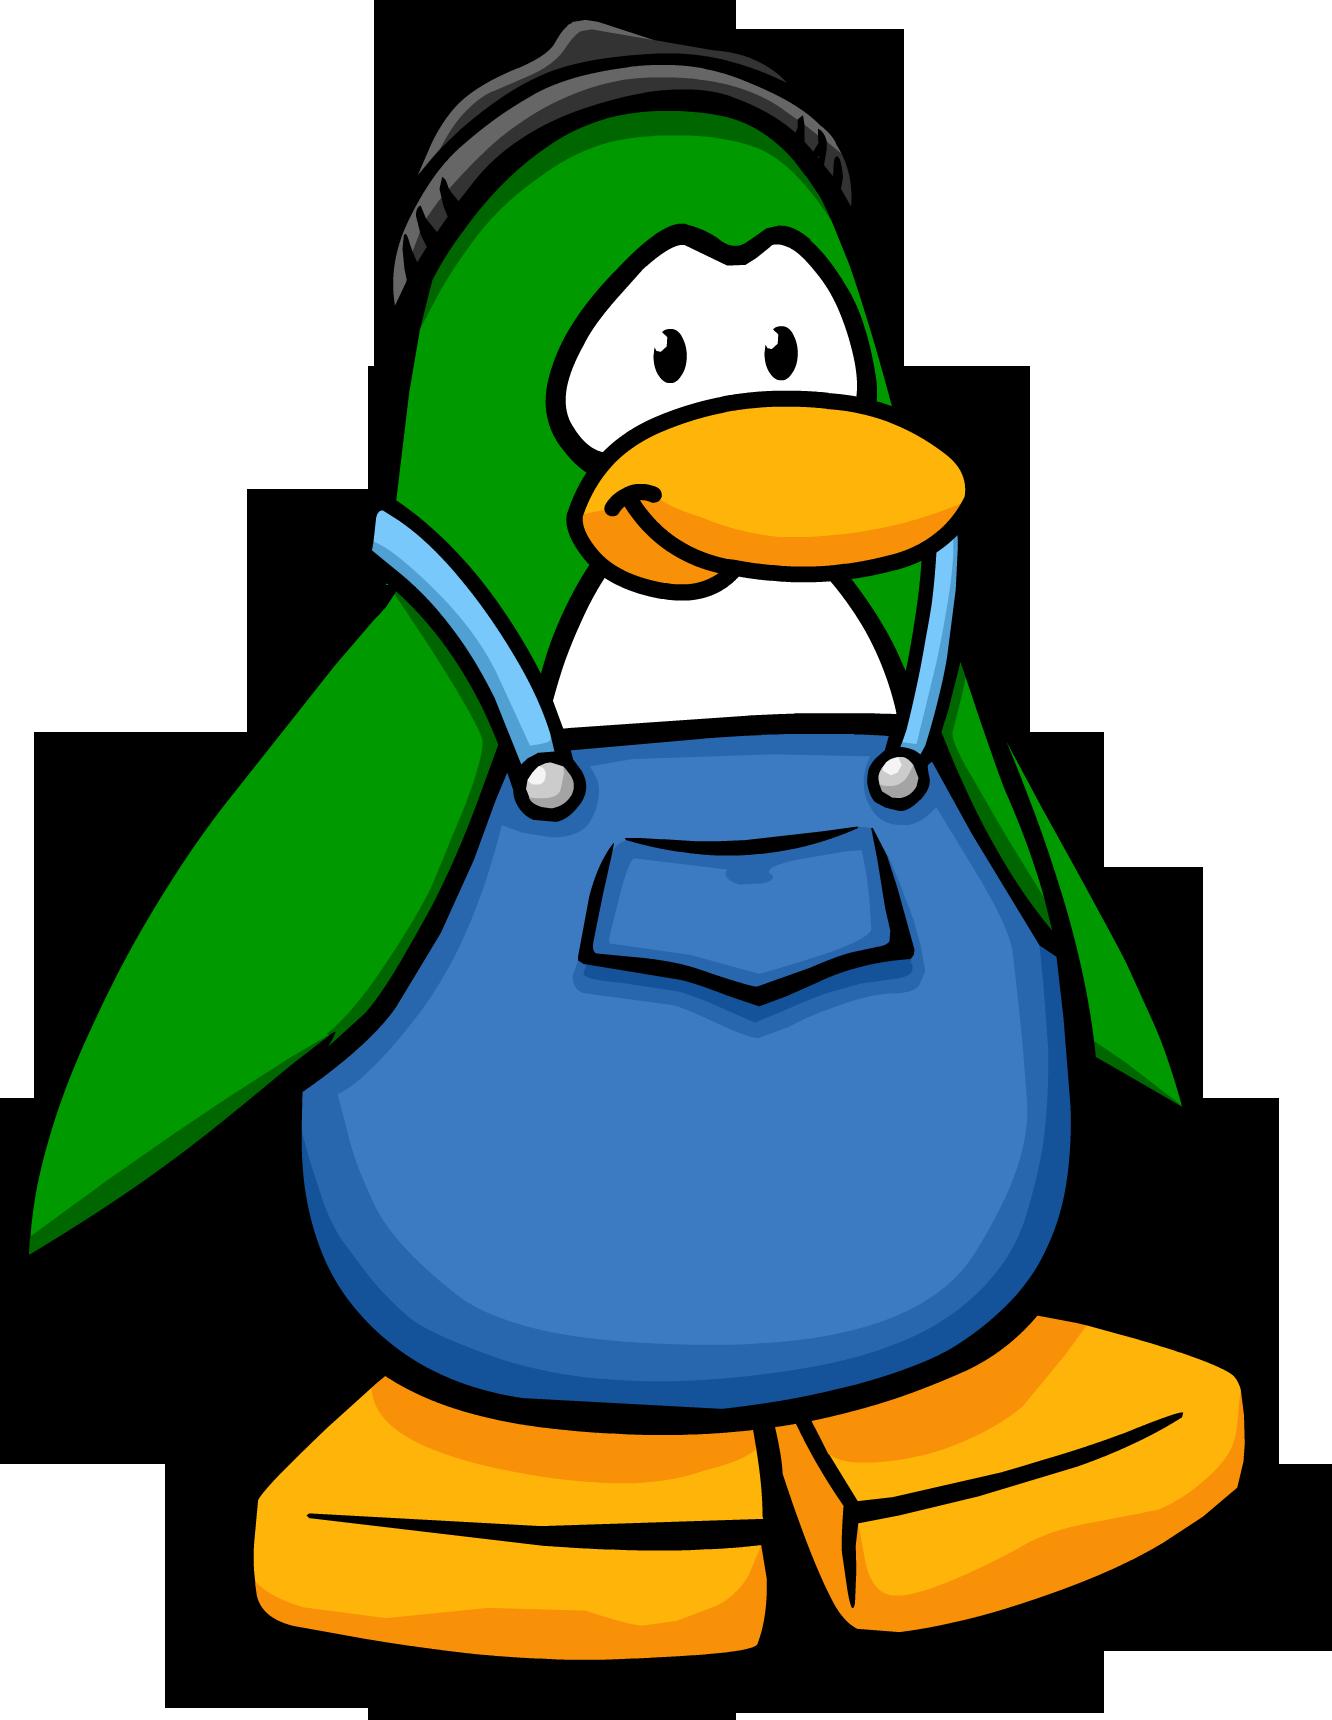 Hydro hopper club rewritten. Clipart penquin penguin flipper